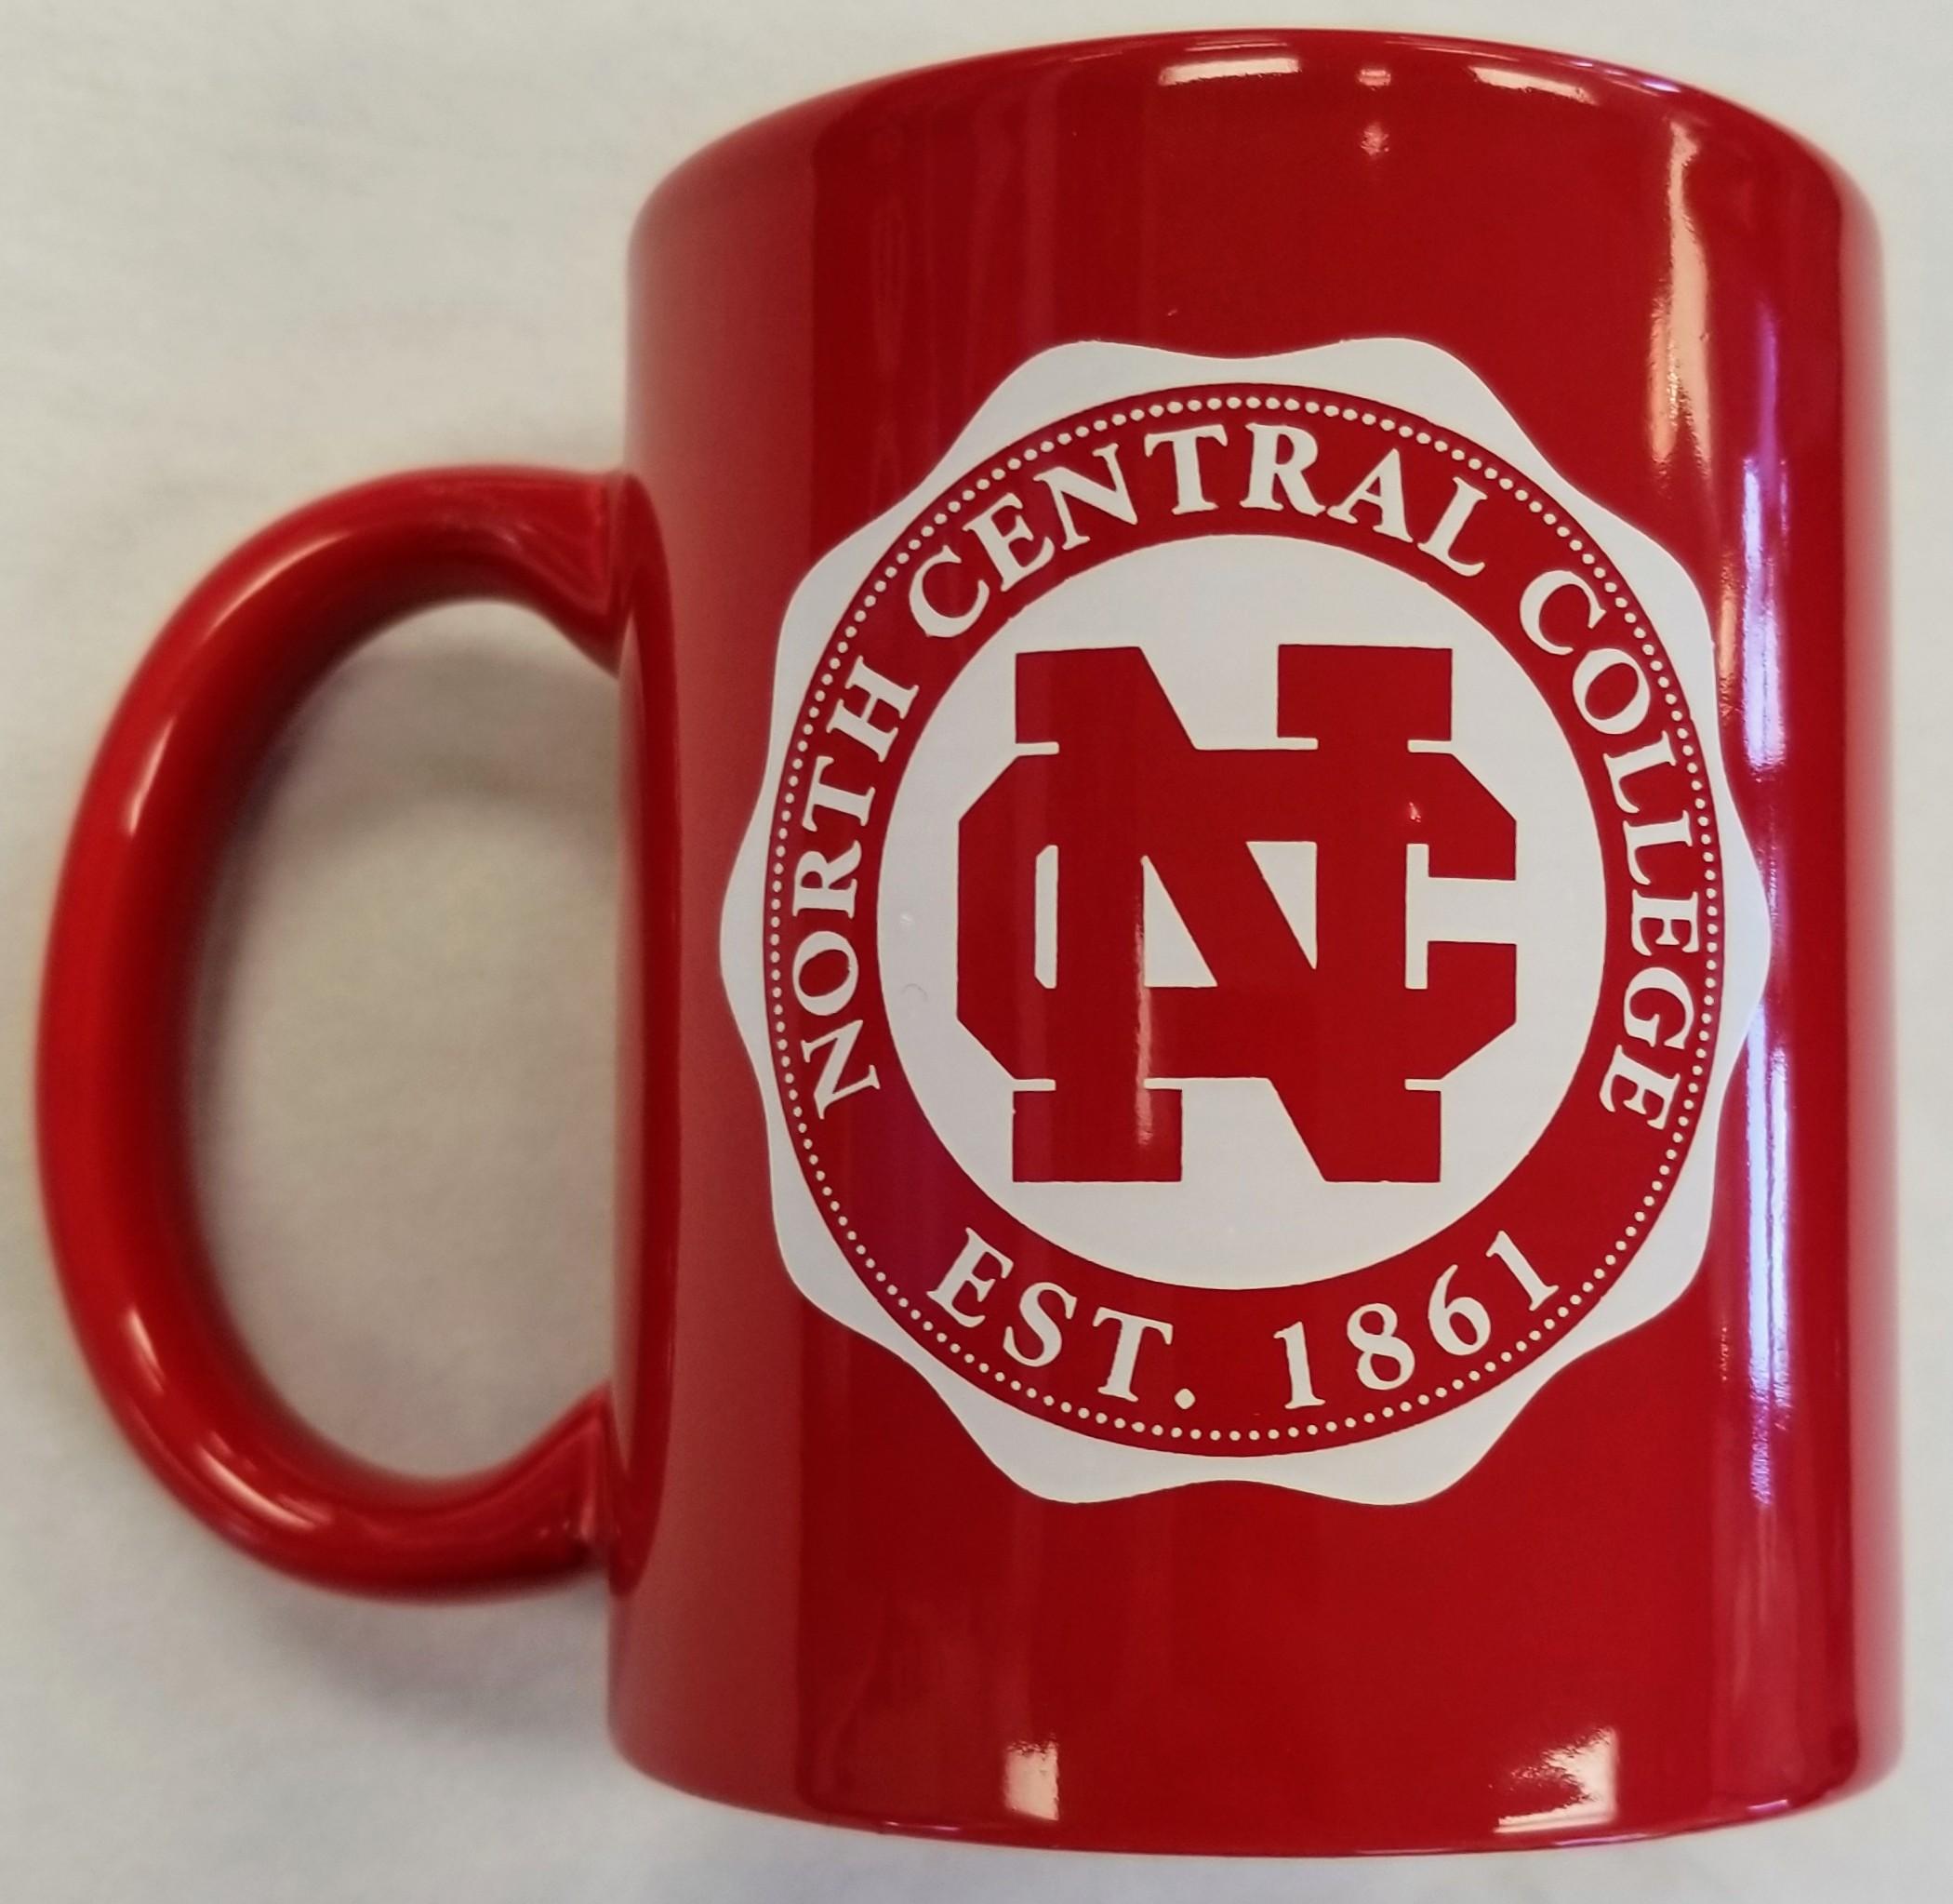 Image for the Traditional Coffee Mug product